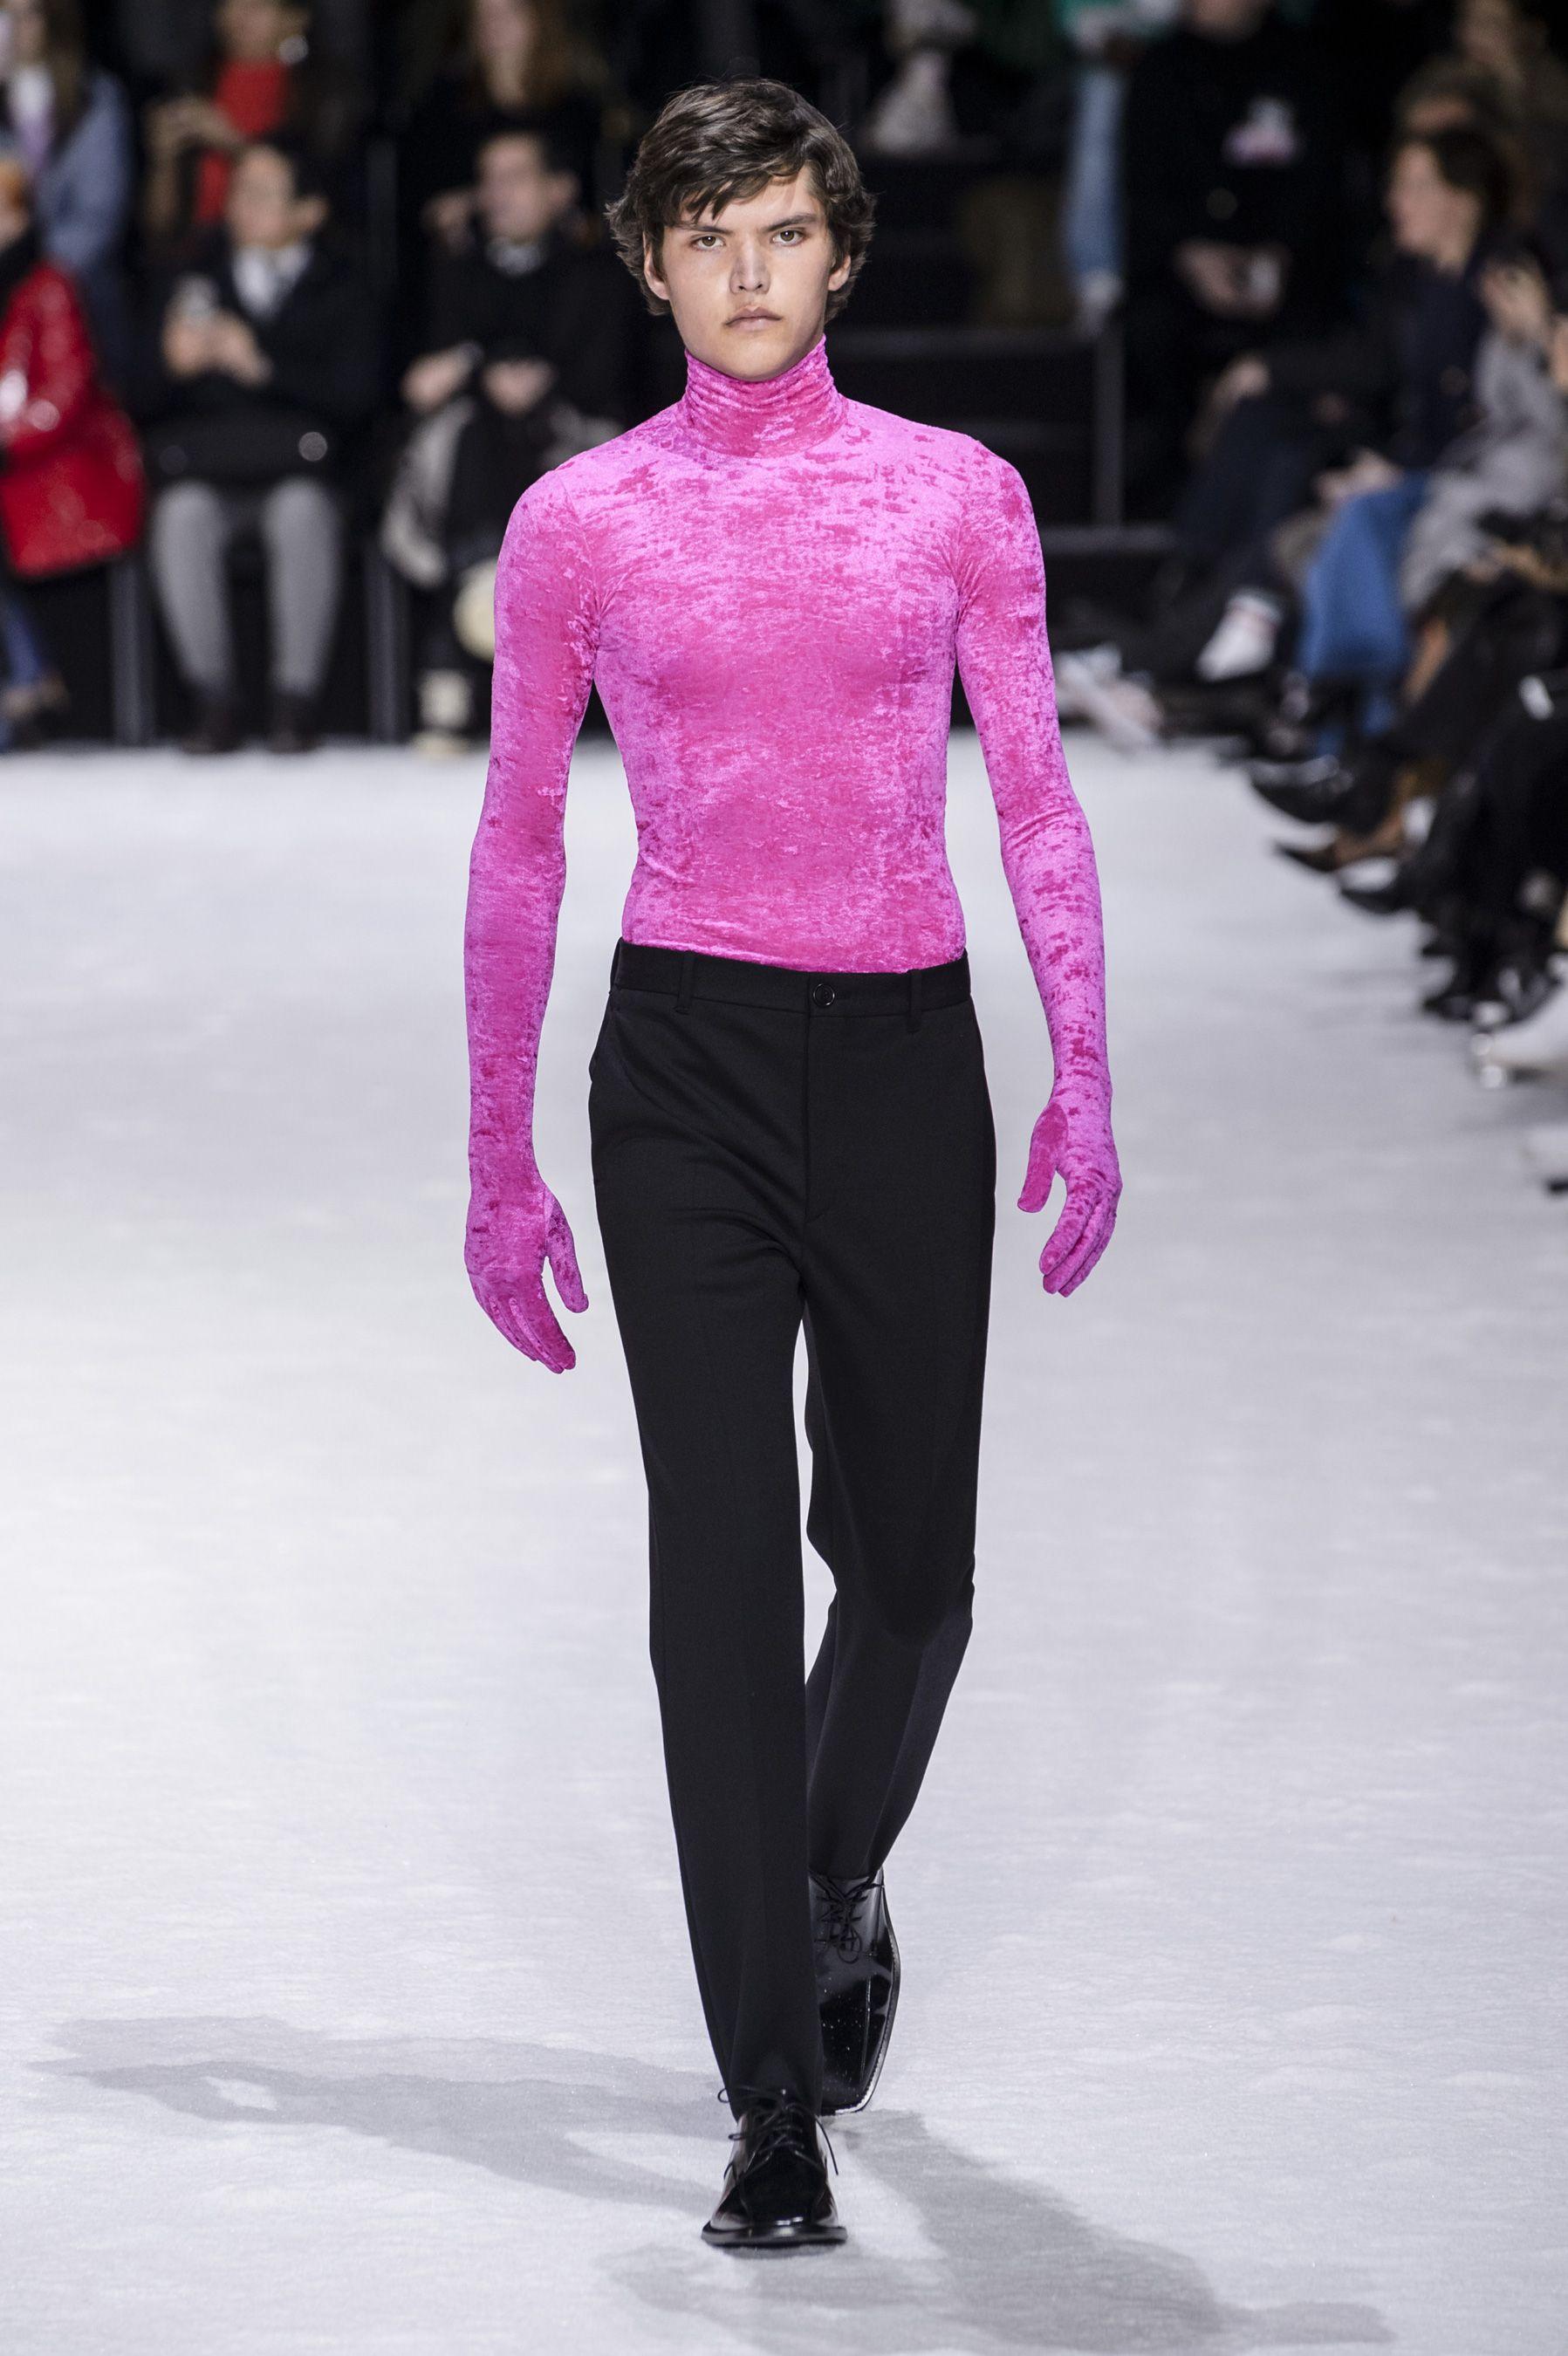 balenciaga fashion show 2018